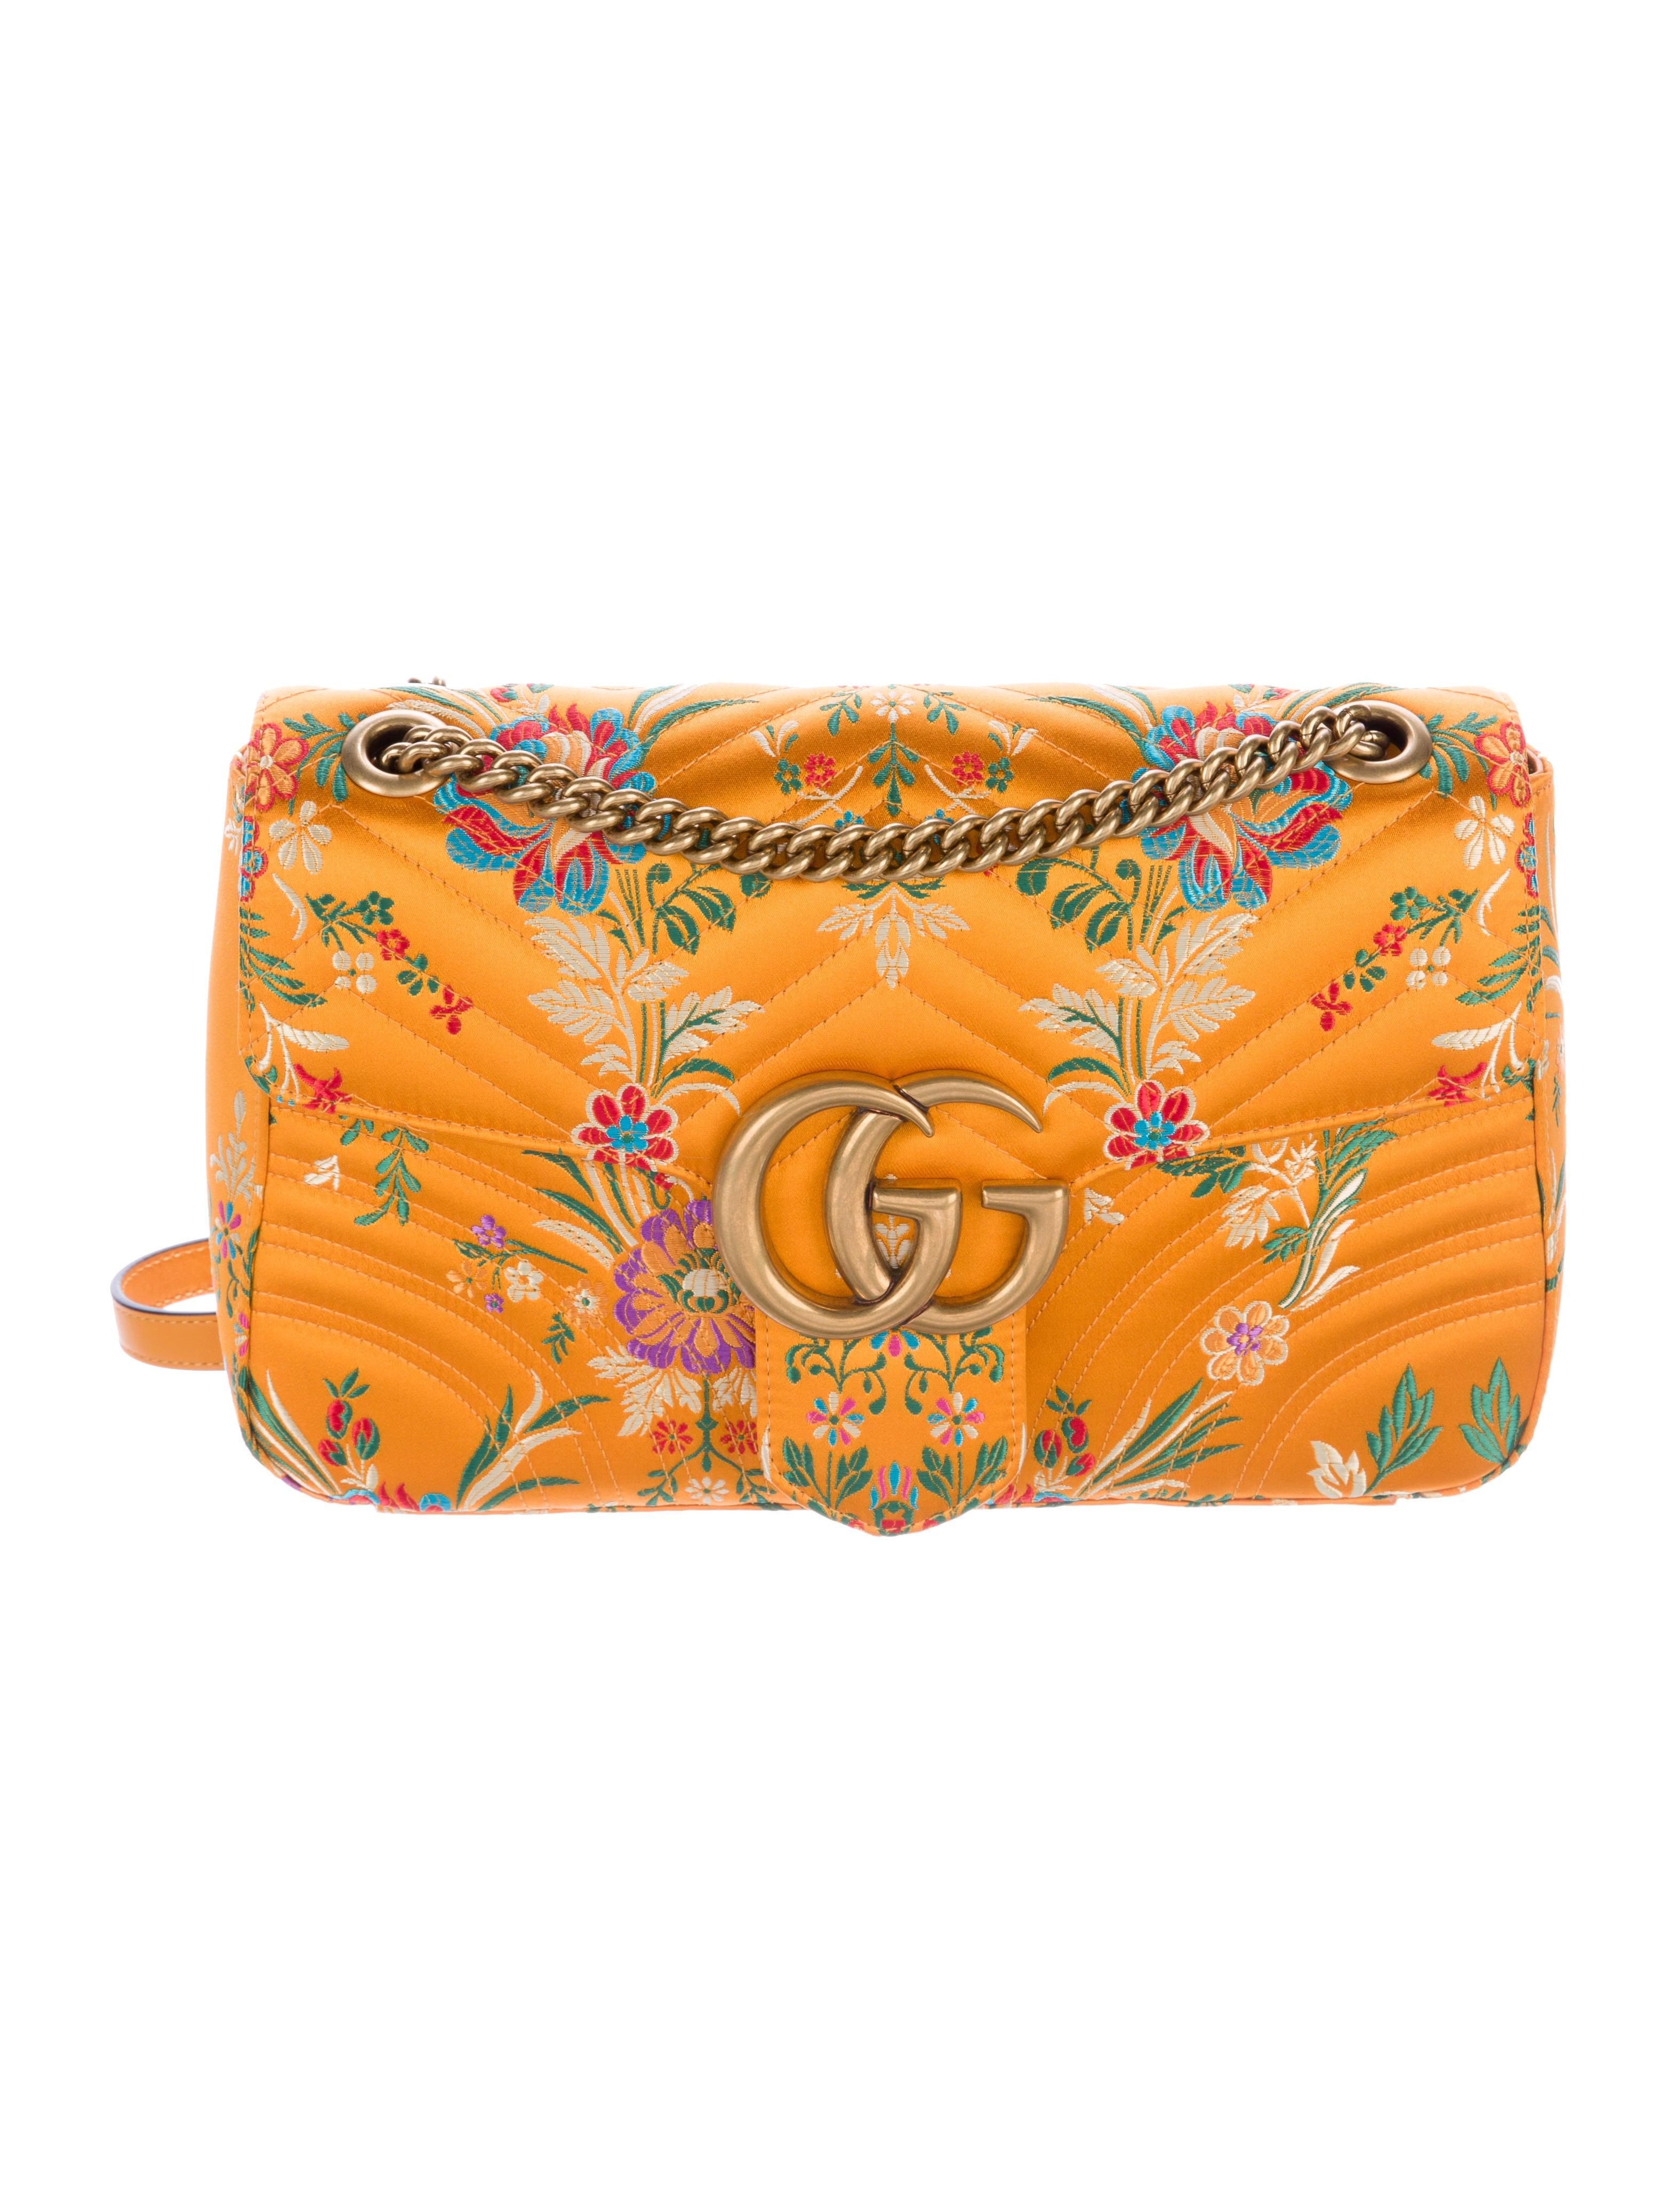 Gucci Spring 2017 GG Marmont Floral Jacquard Shoulder Bag W/ Tags - Handbags - GUC145173 | The ...